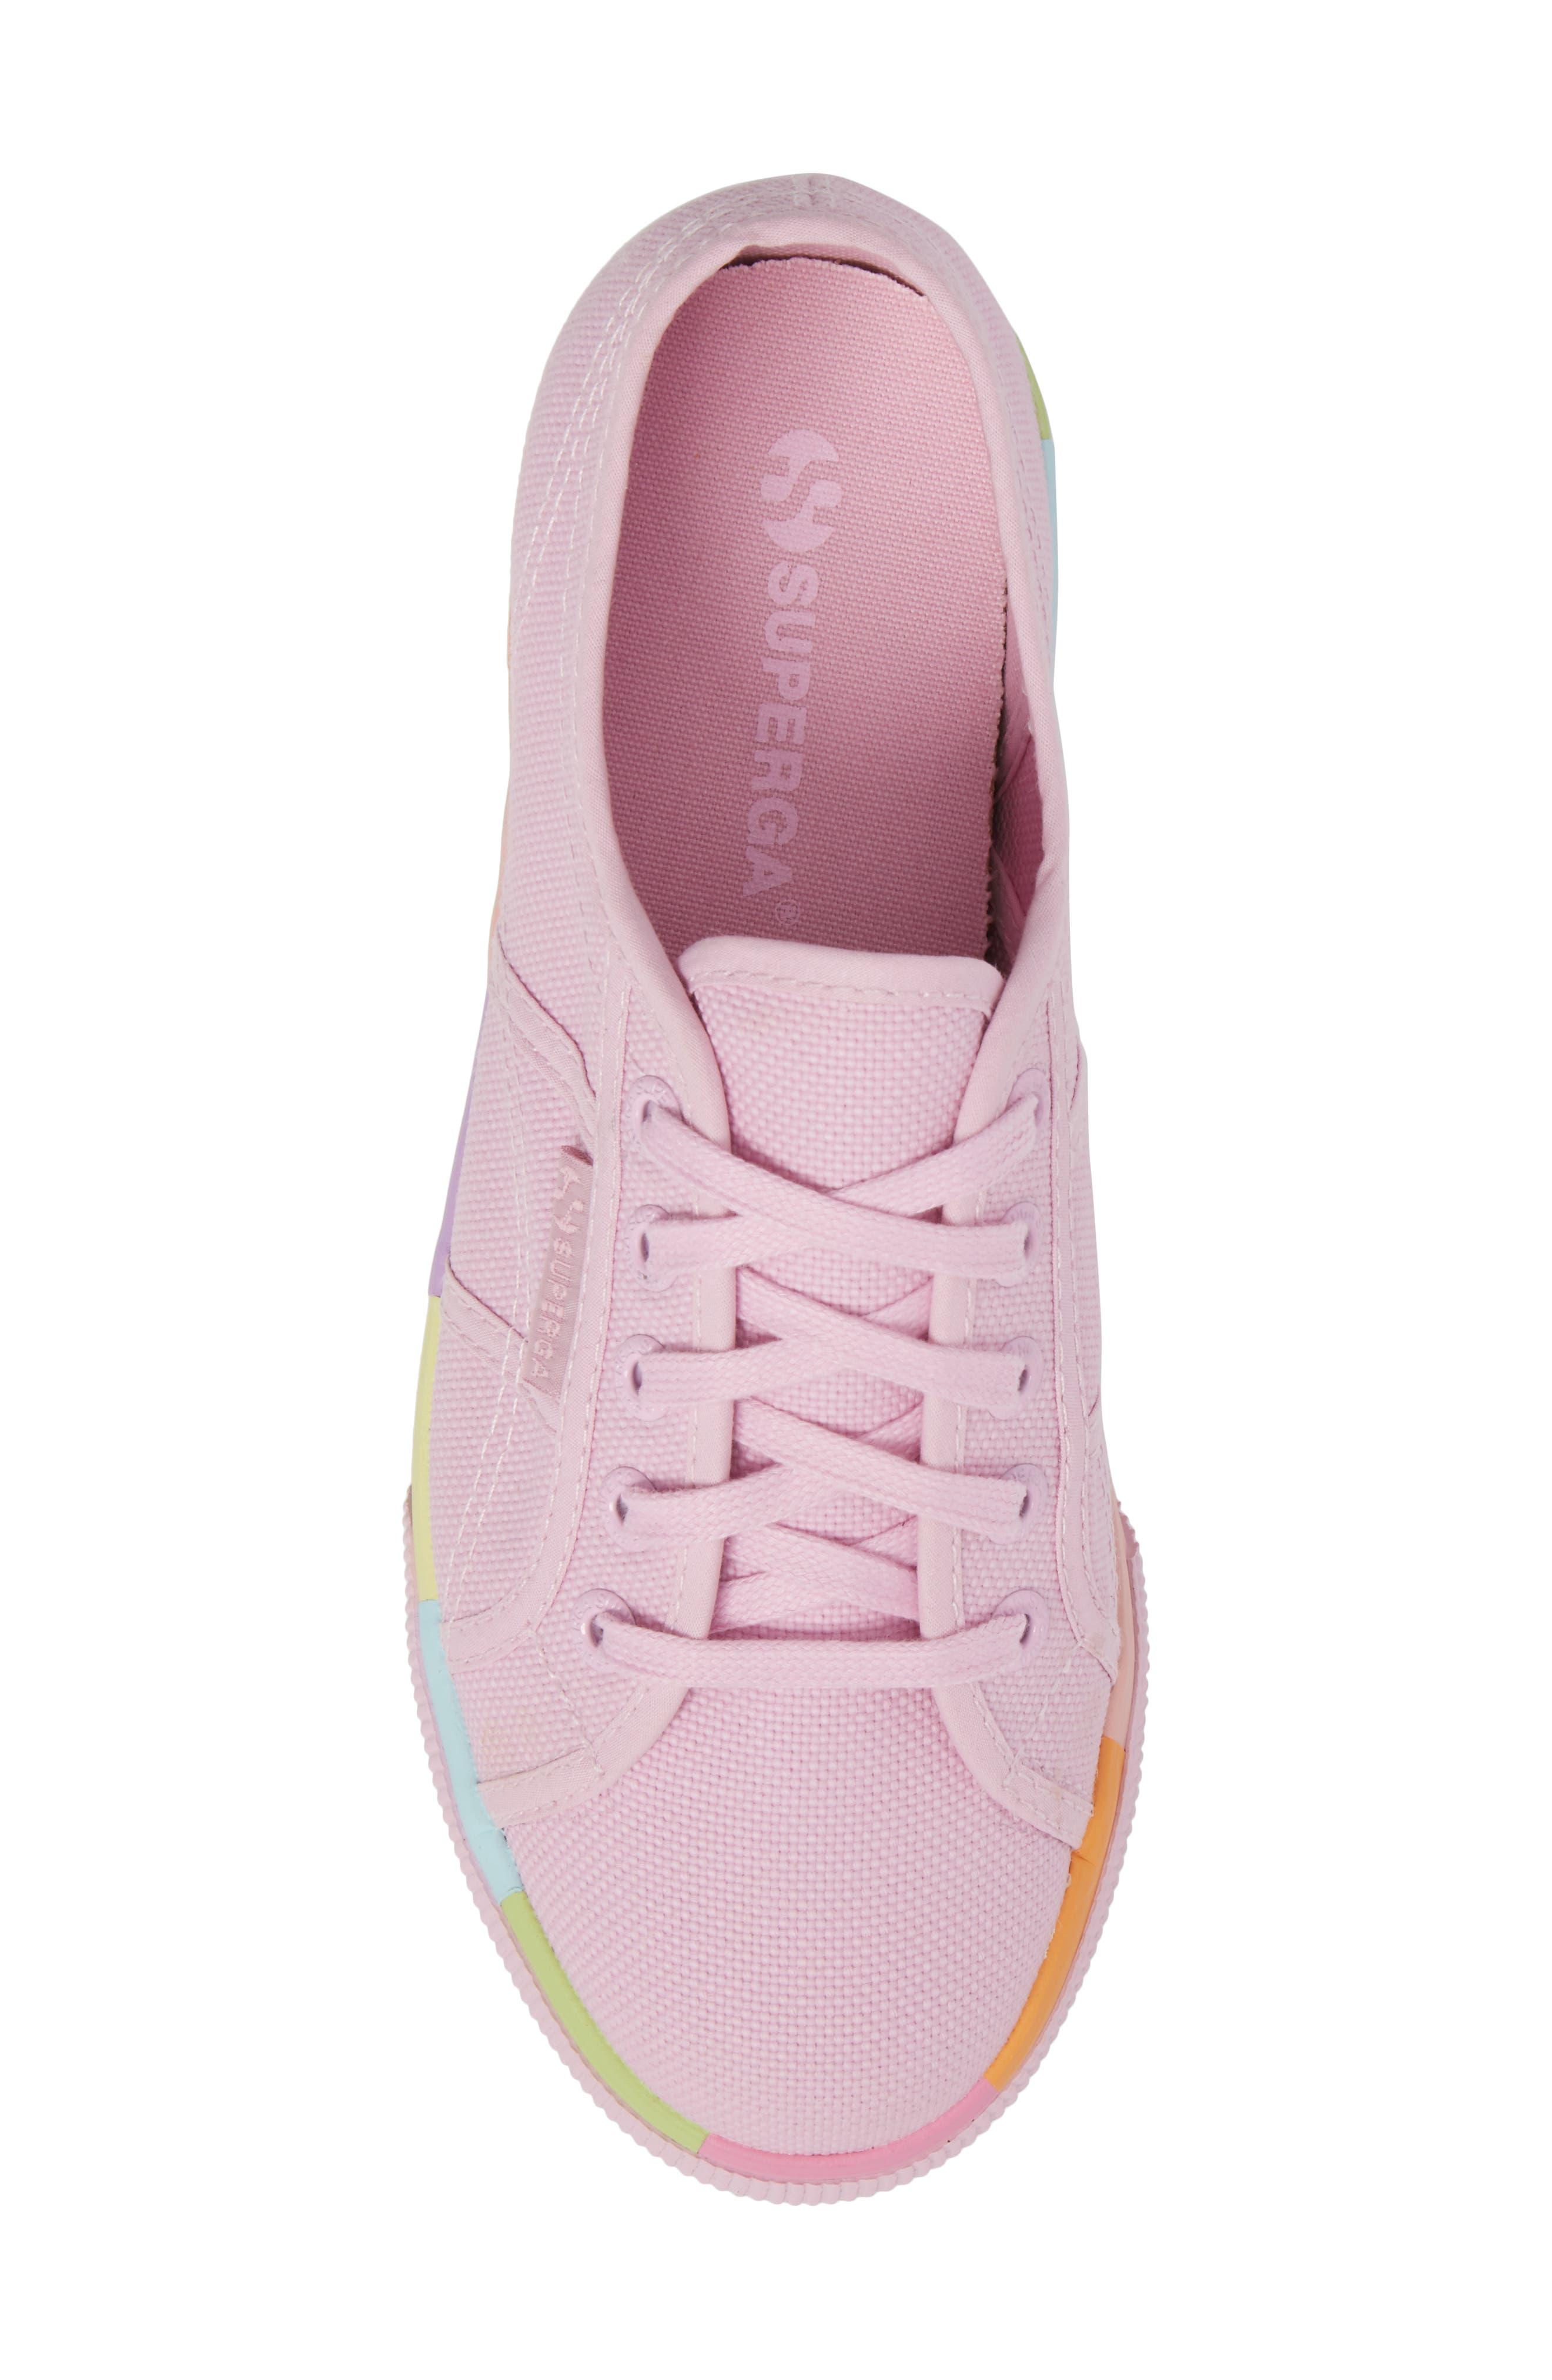 2790 Platform Sneaker,                             Alternate thumbnail 5, color,                             Pink